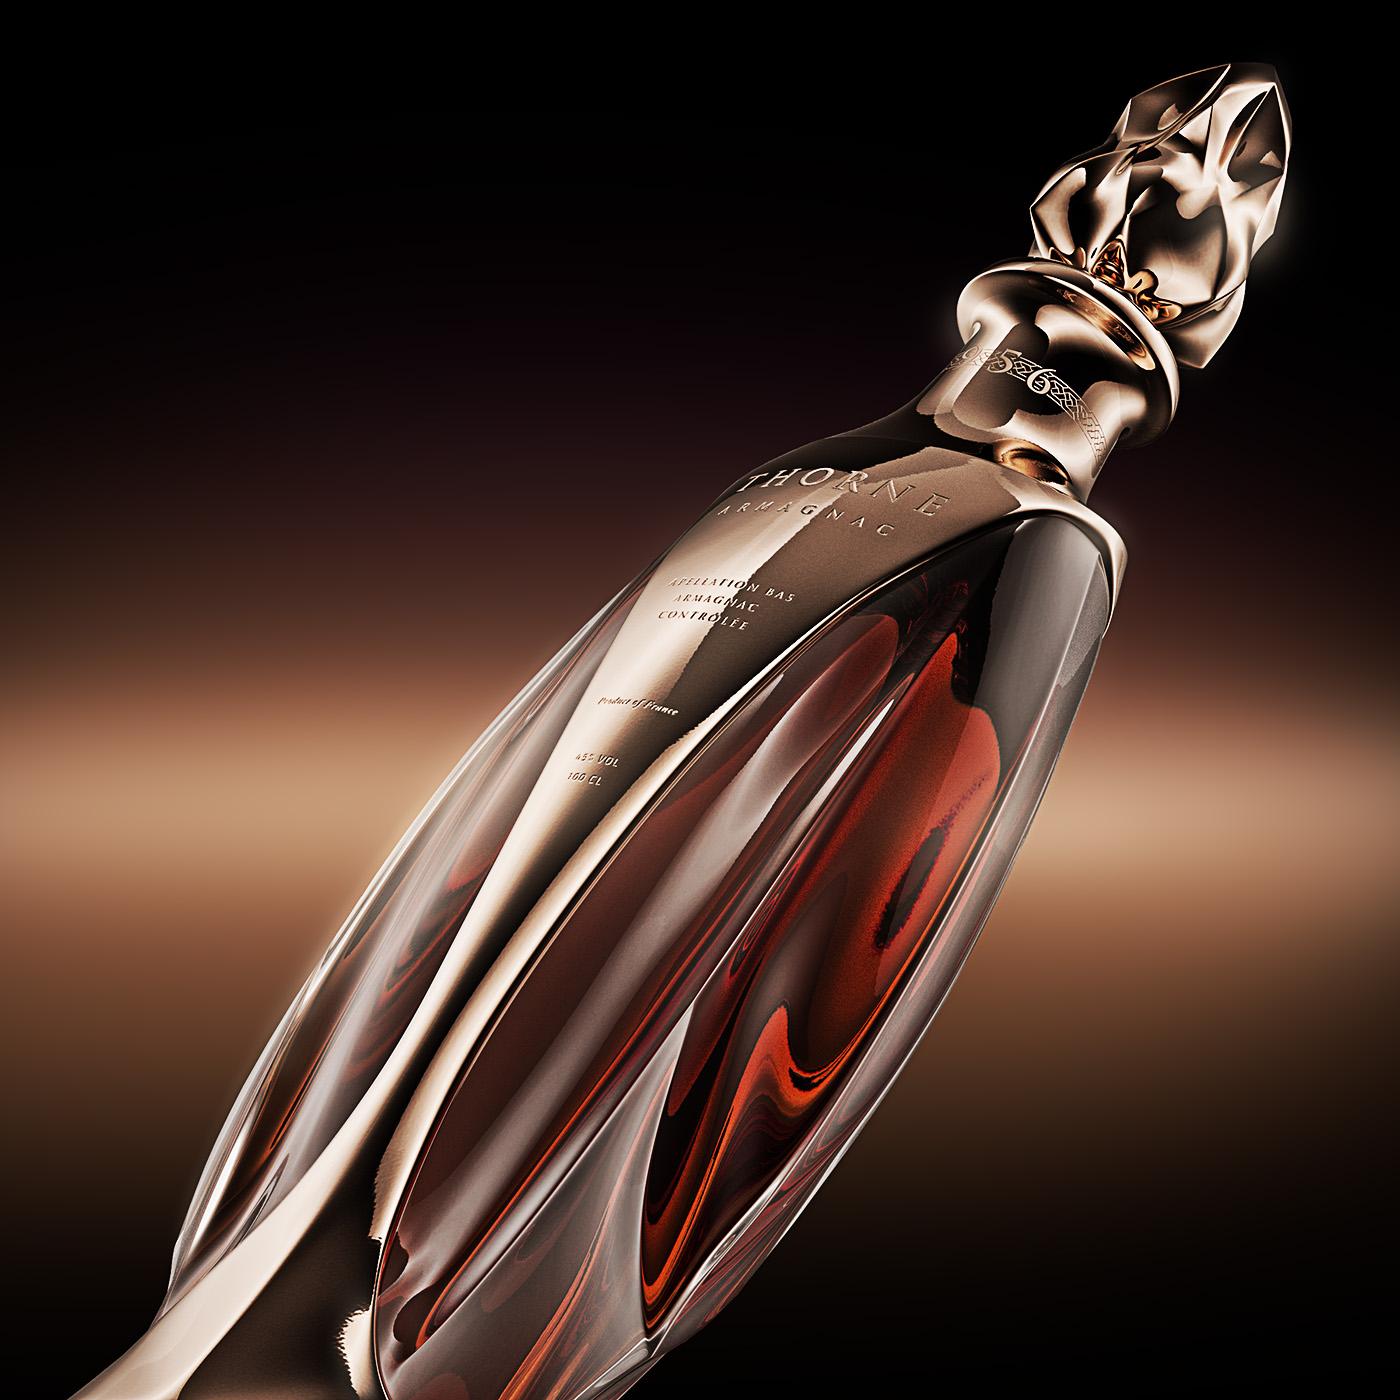 Thorne luxury armagnac bottle 3.jpg